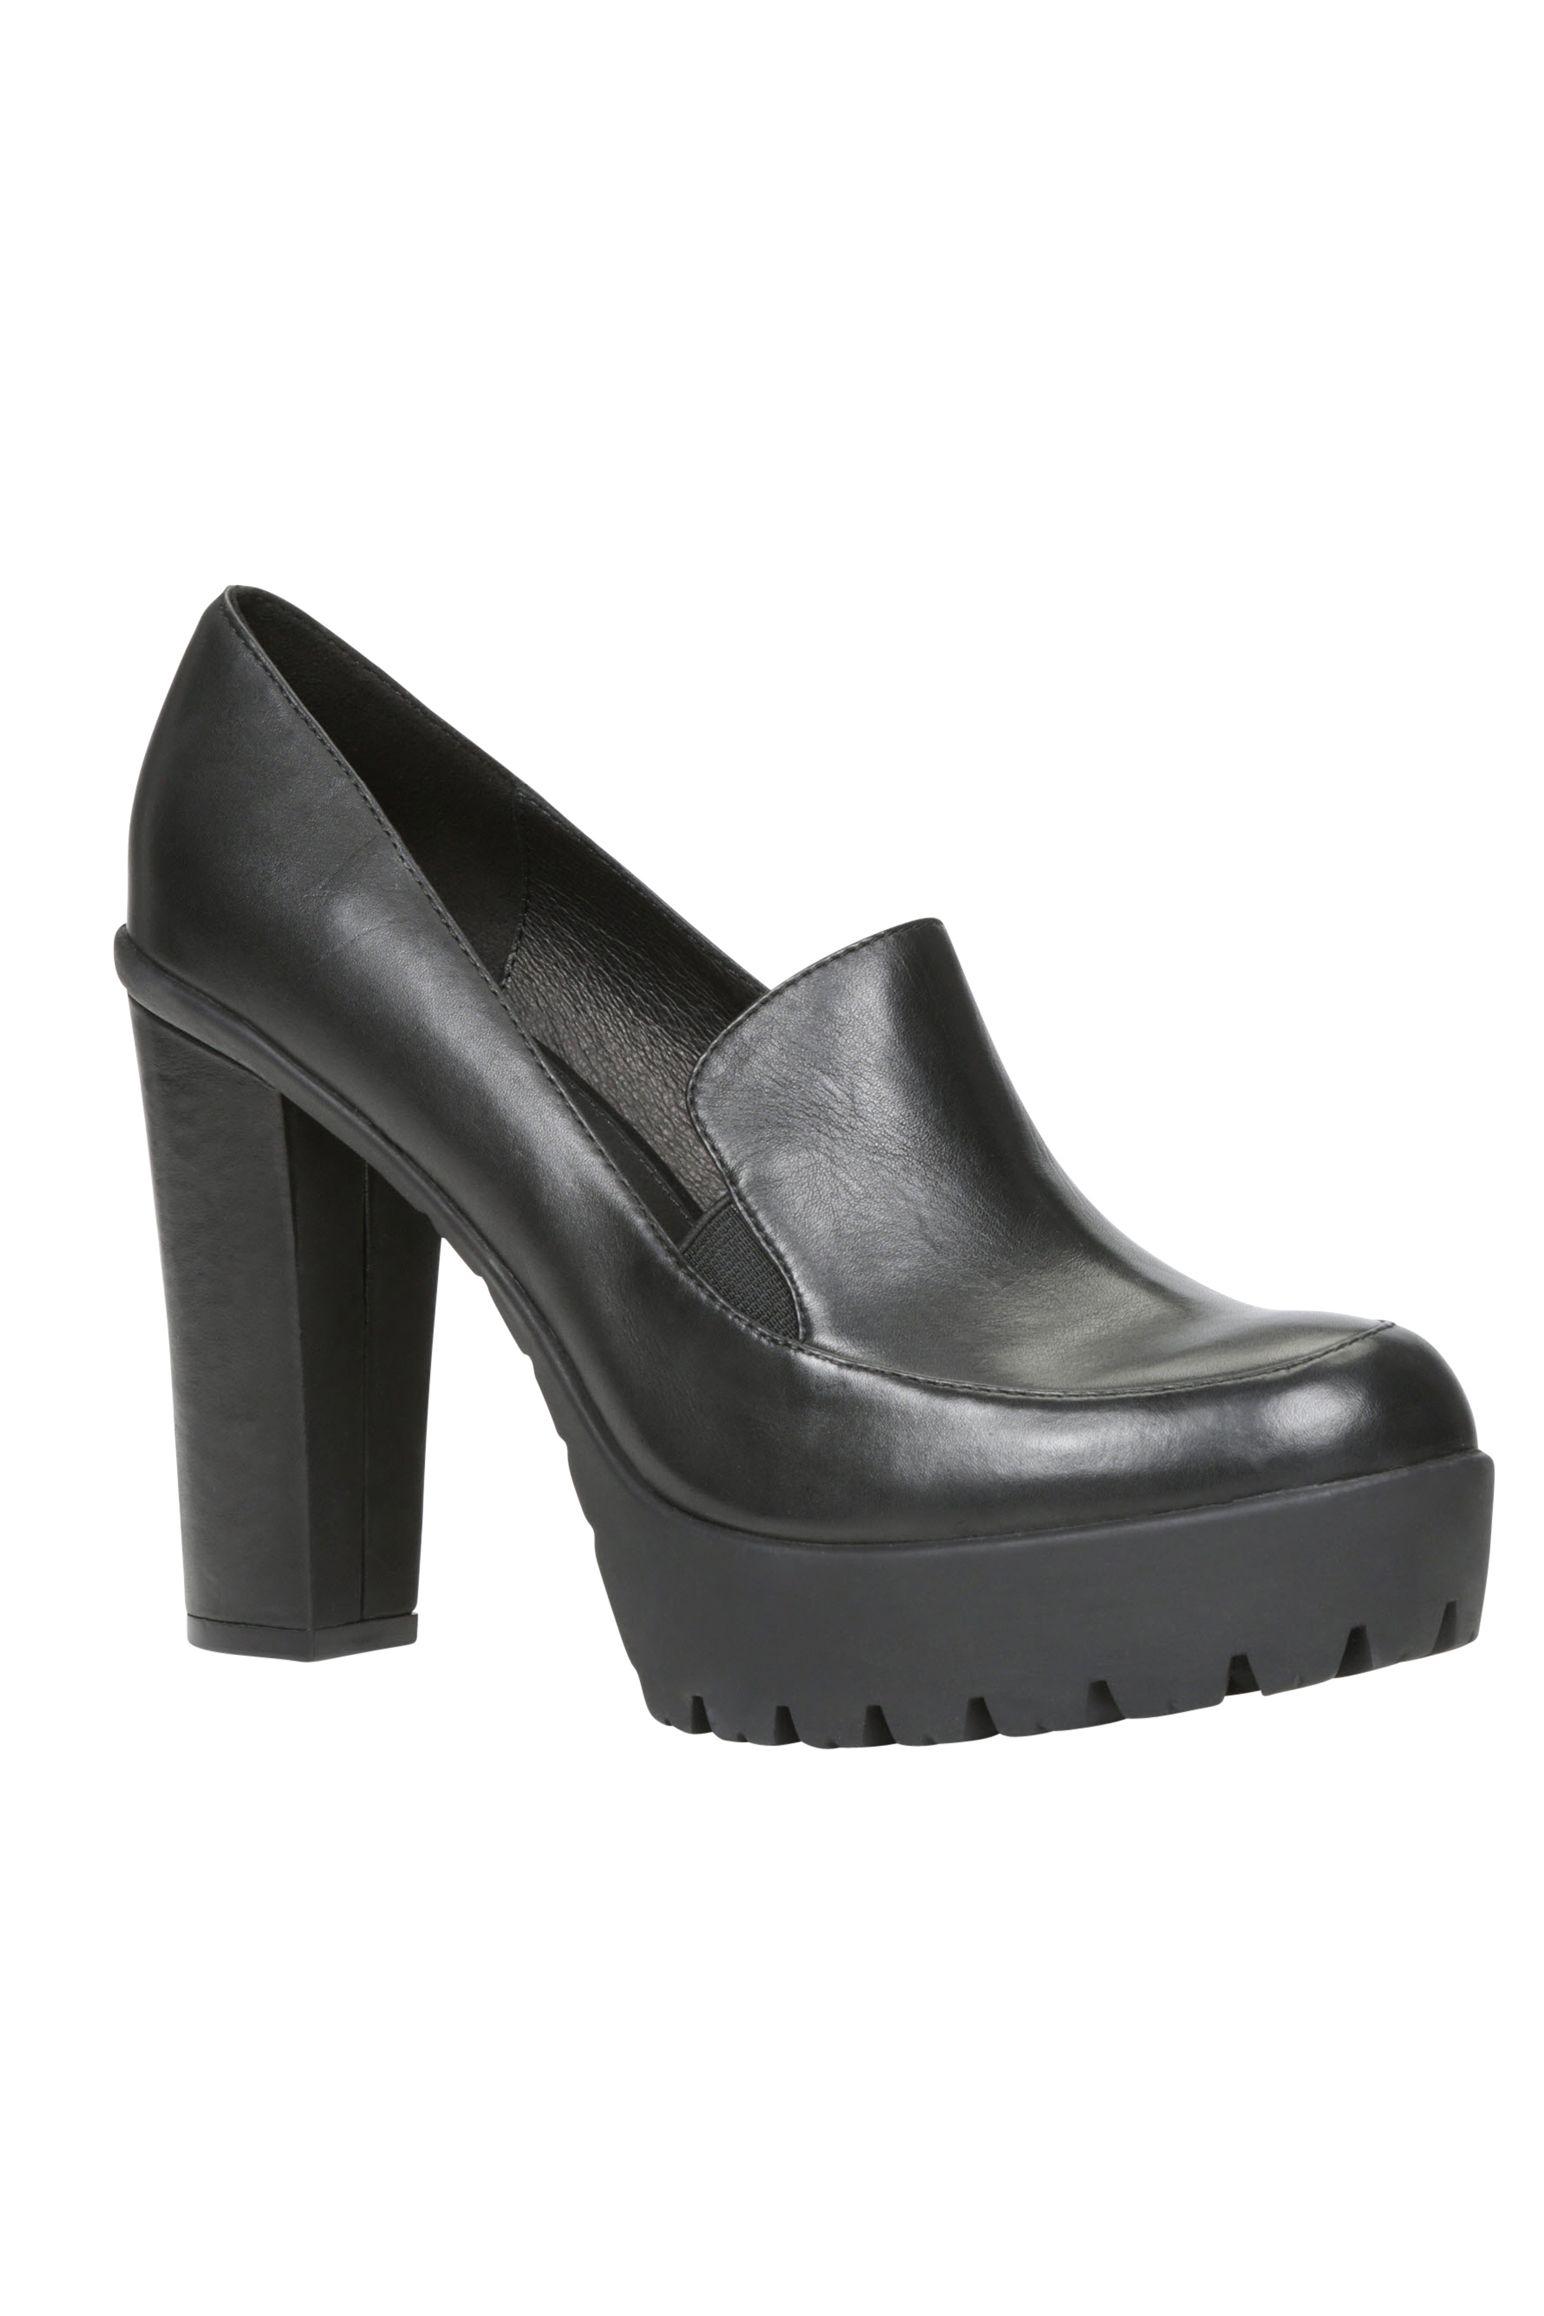 "Aldo Keren Pump, $50&#x3B; <a href=""http://www.aldoshoes.com/us/en_US/women/shoes/high-heels/c/112/KEREN/p/34703601-97"">aldoshoes.com </a>"